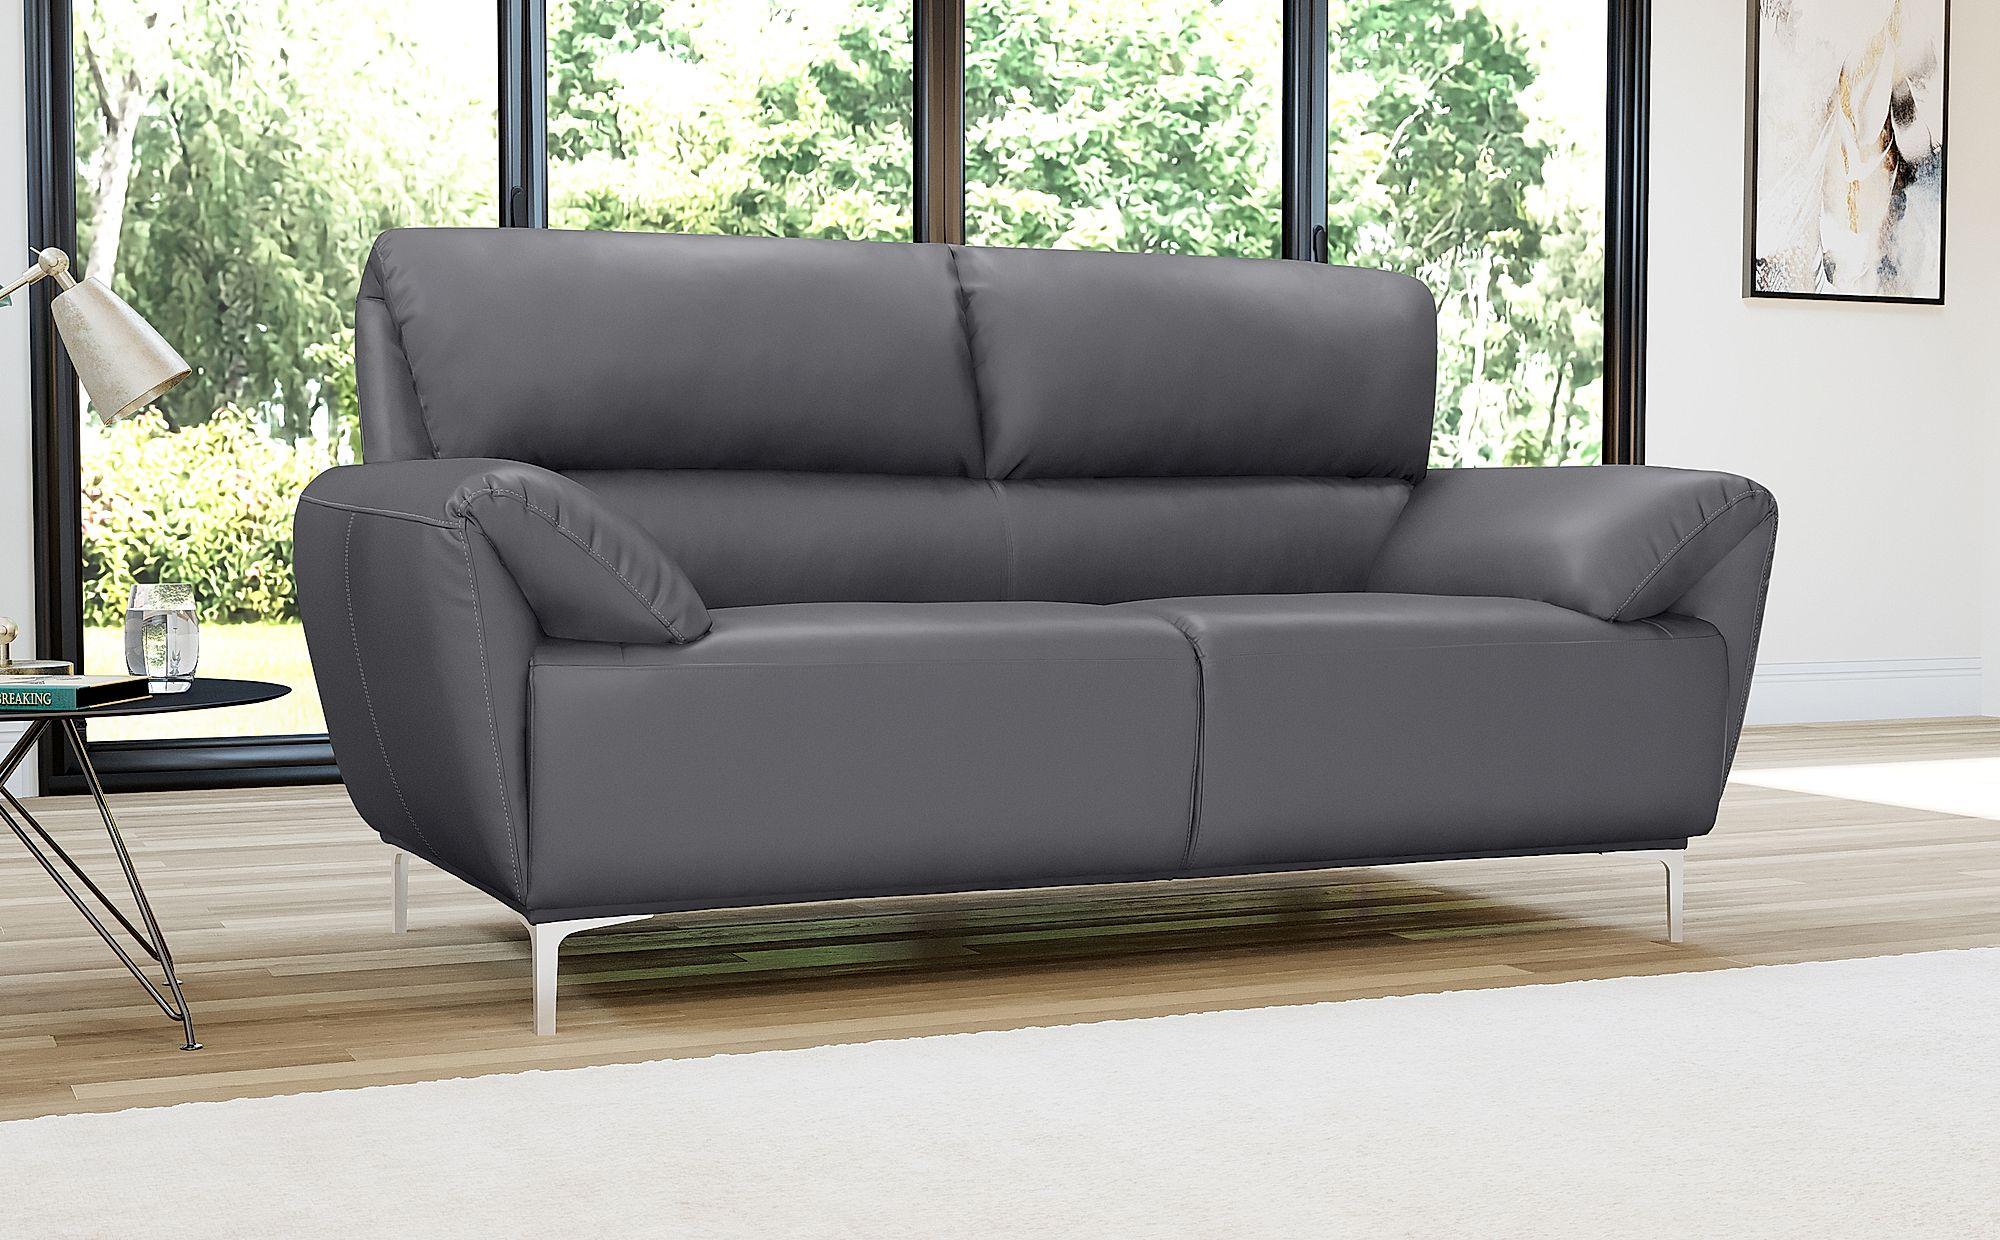 Super Enzo Grey Leather Sofa 3 2 Seater Home Interior And Landscaping Ponolsignezvosmurscom